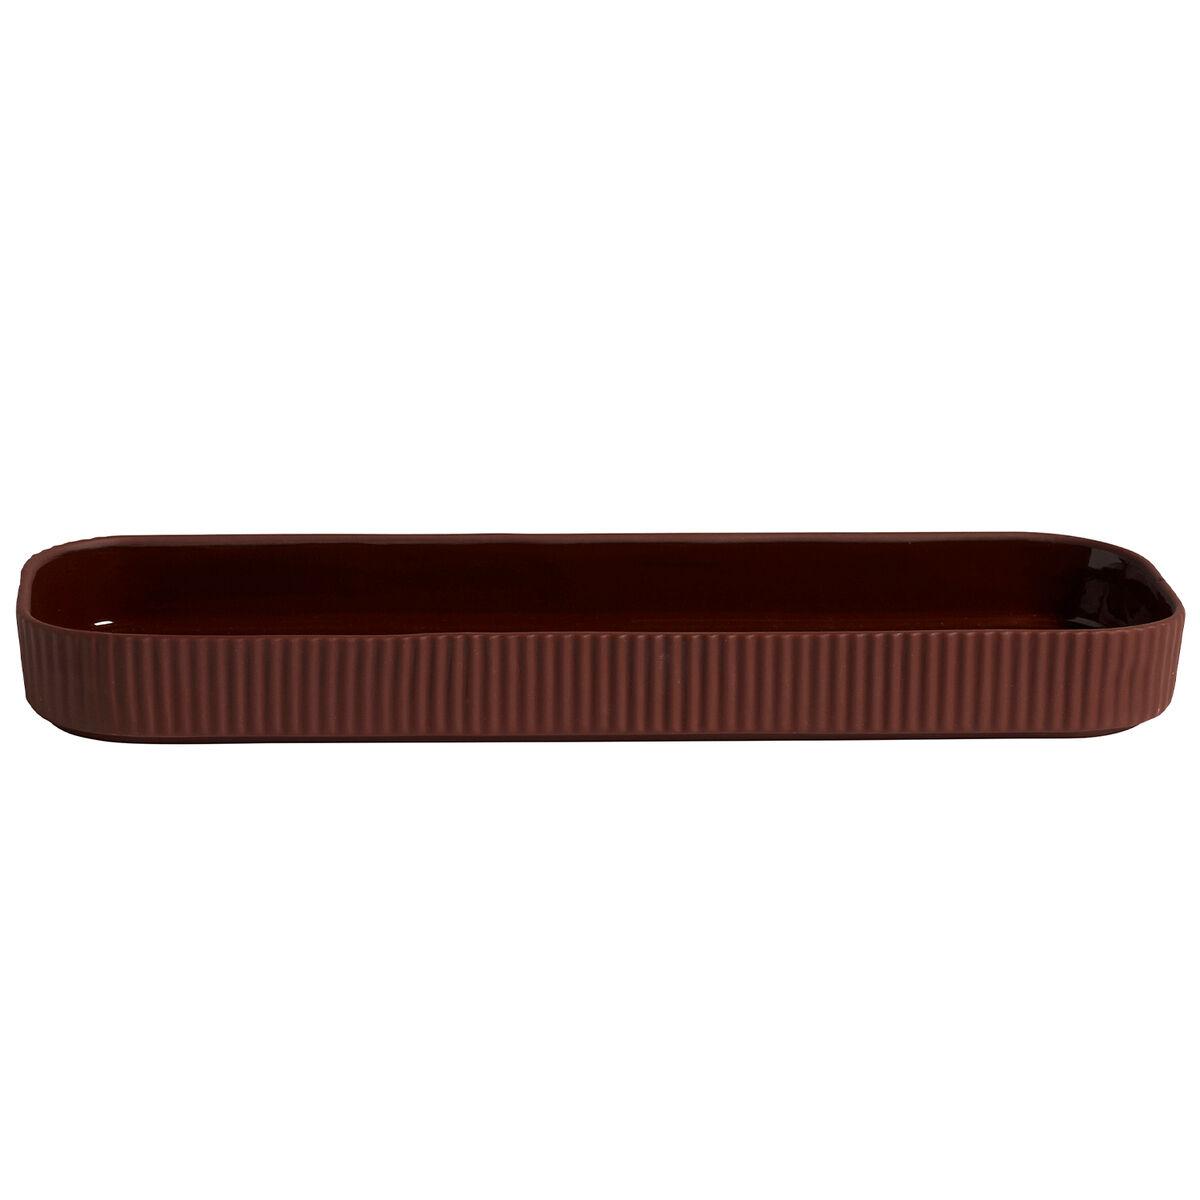 Hay Facade tray, dark terracotta